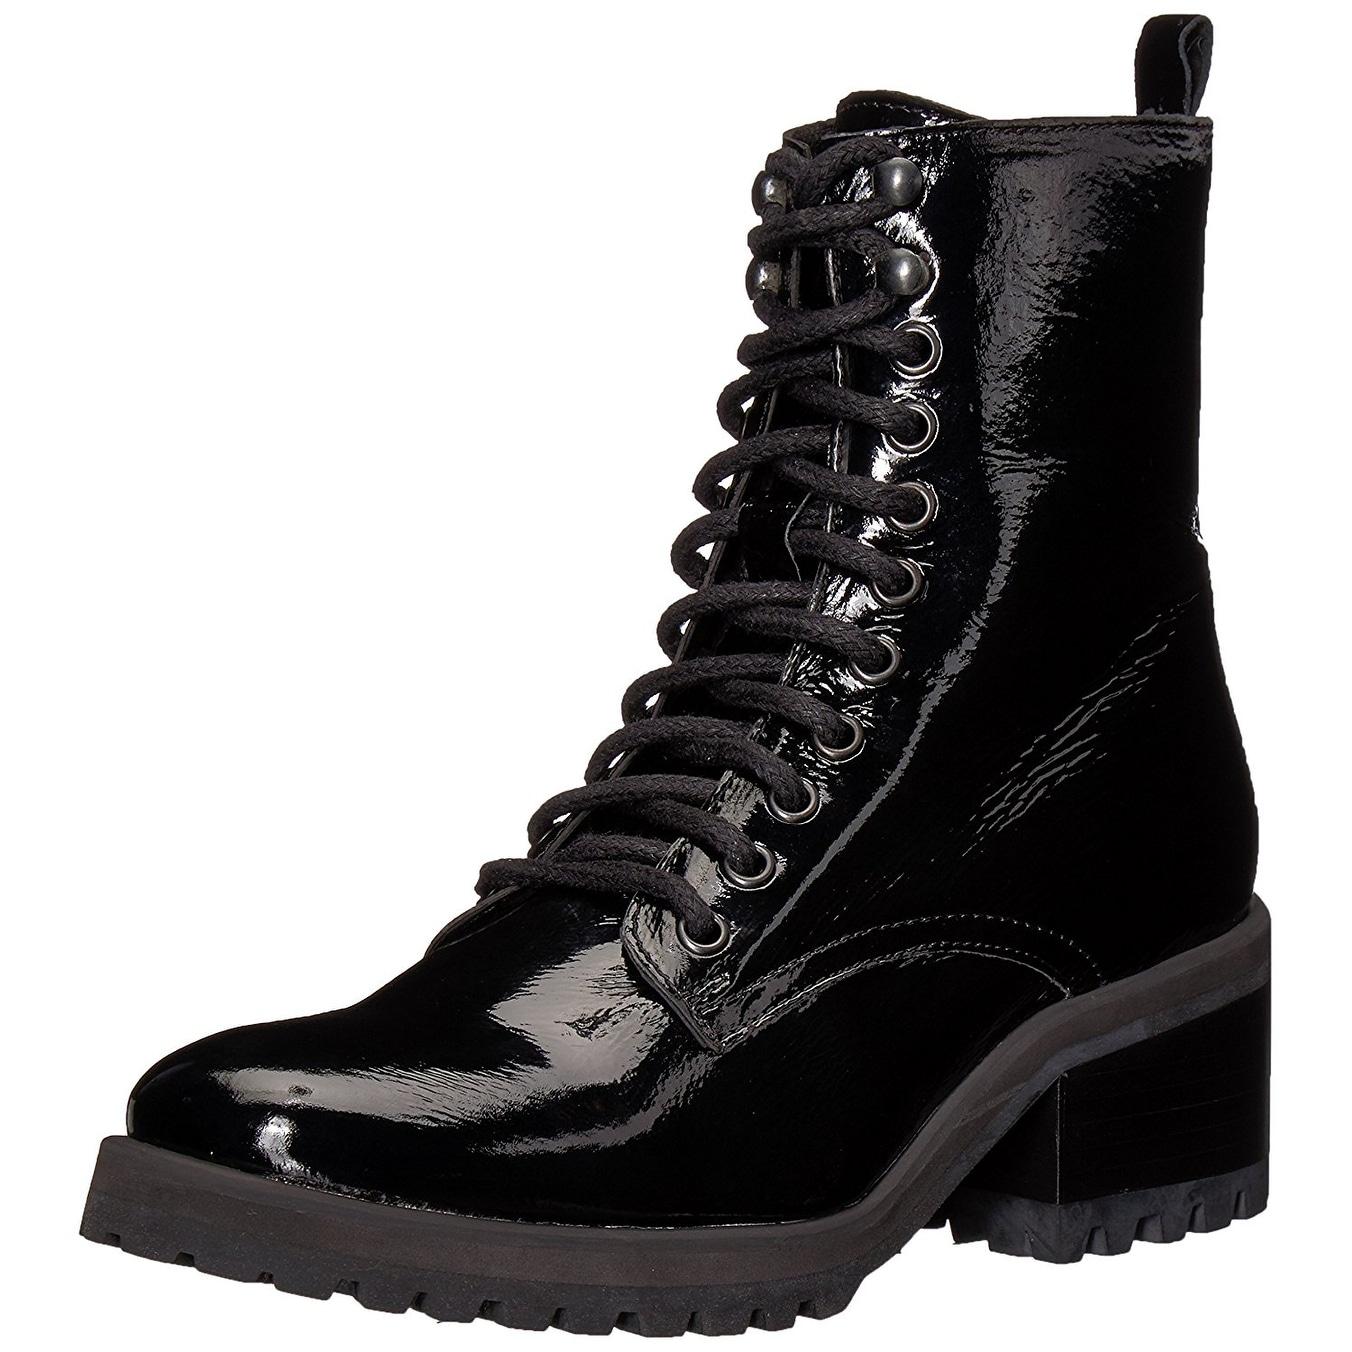 67e5441ca81 Steve Madden Womens gene Closed Toe Mid-Calf Fashion Boots